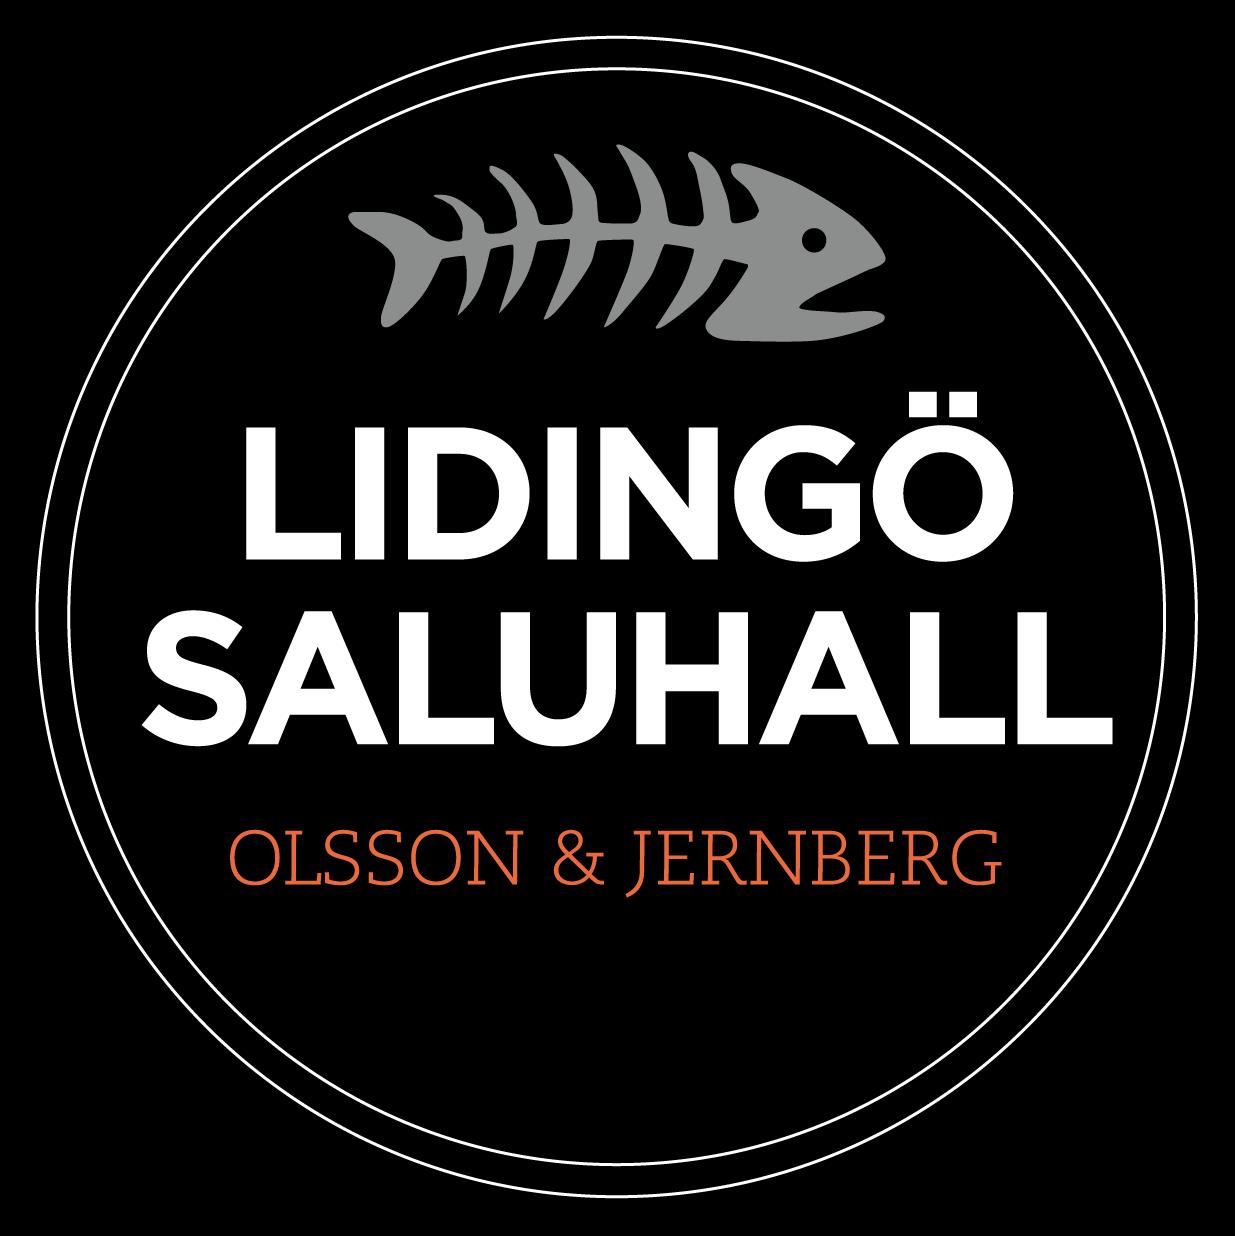 saluhall-final.png